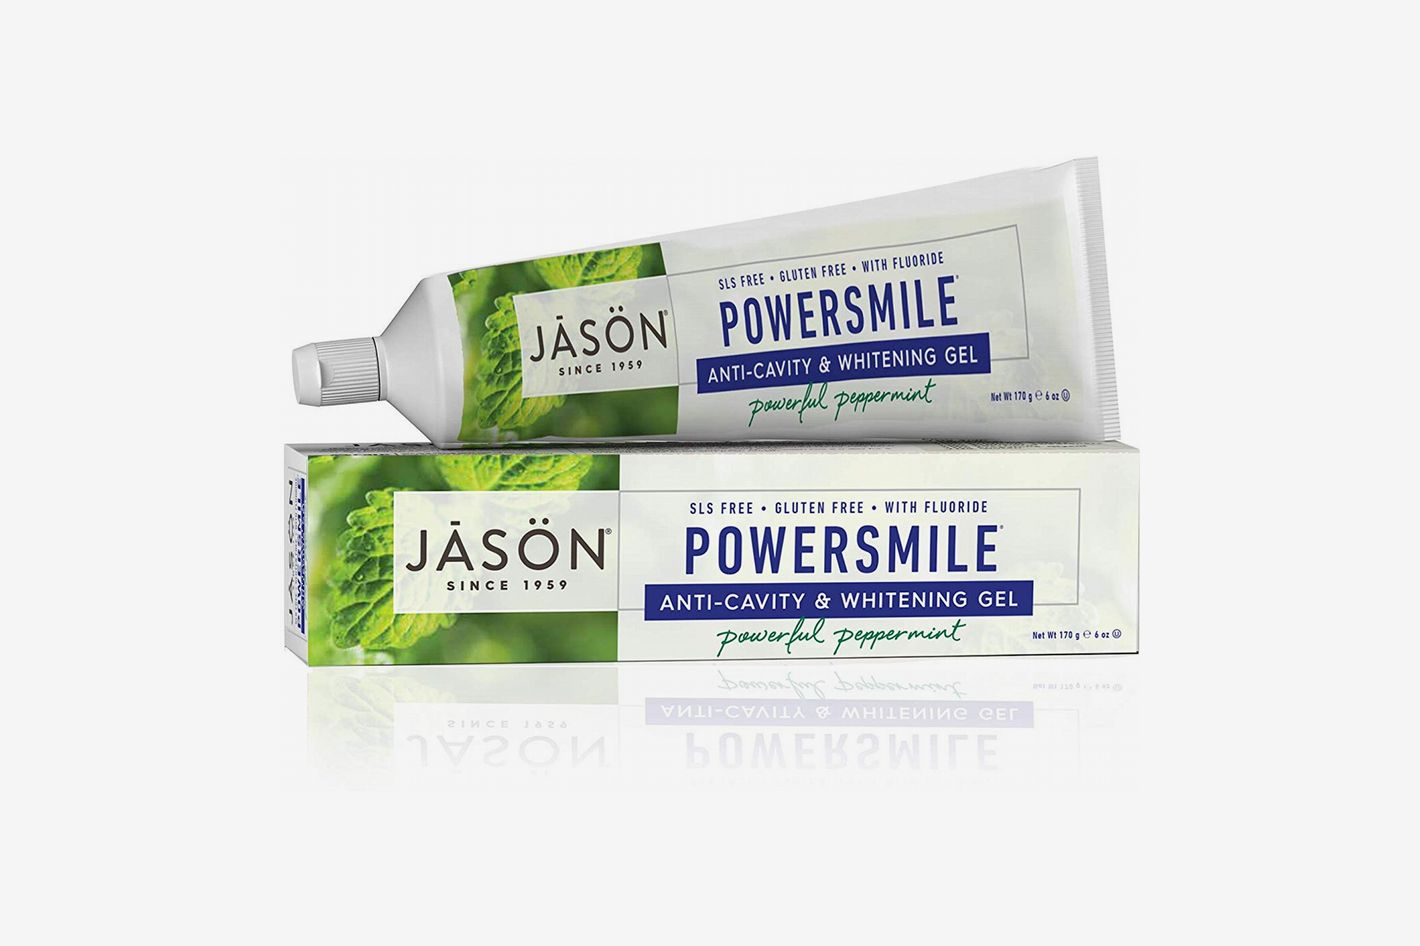 Jason Powersmile Anti-Cavity & Whitening Gel